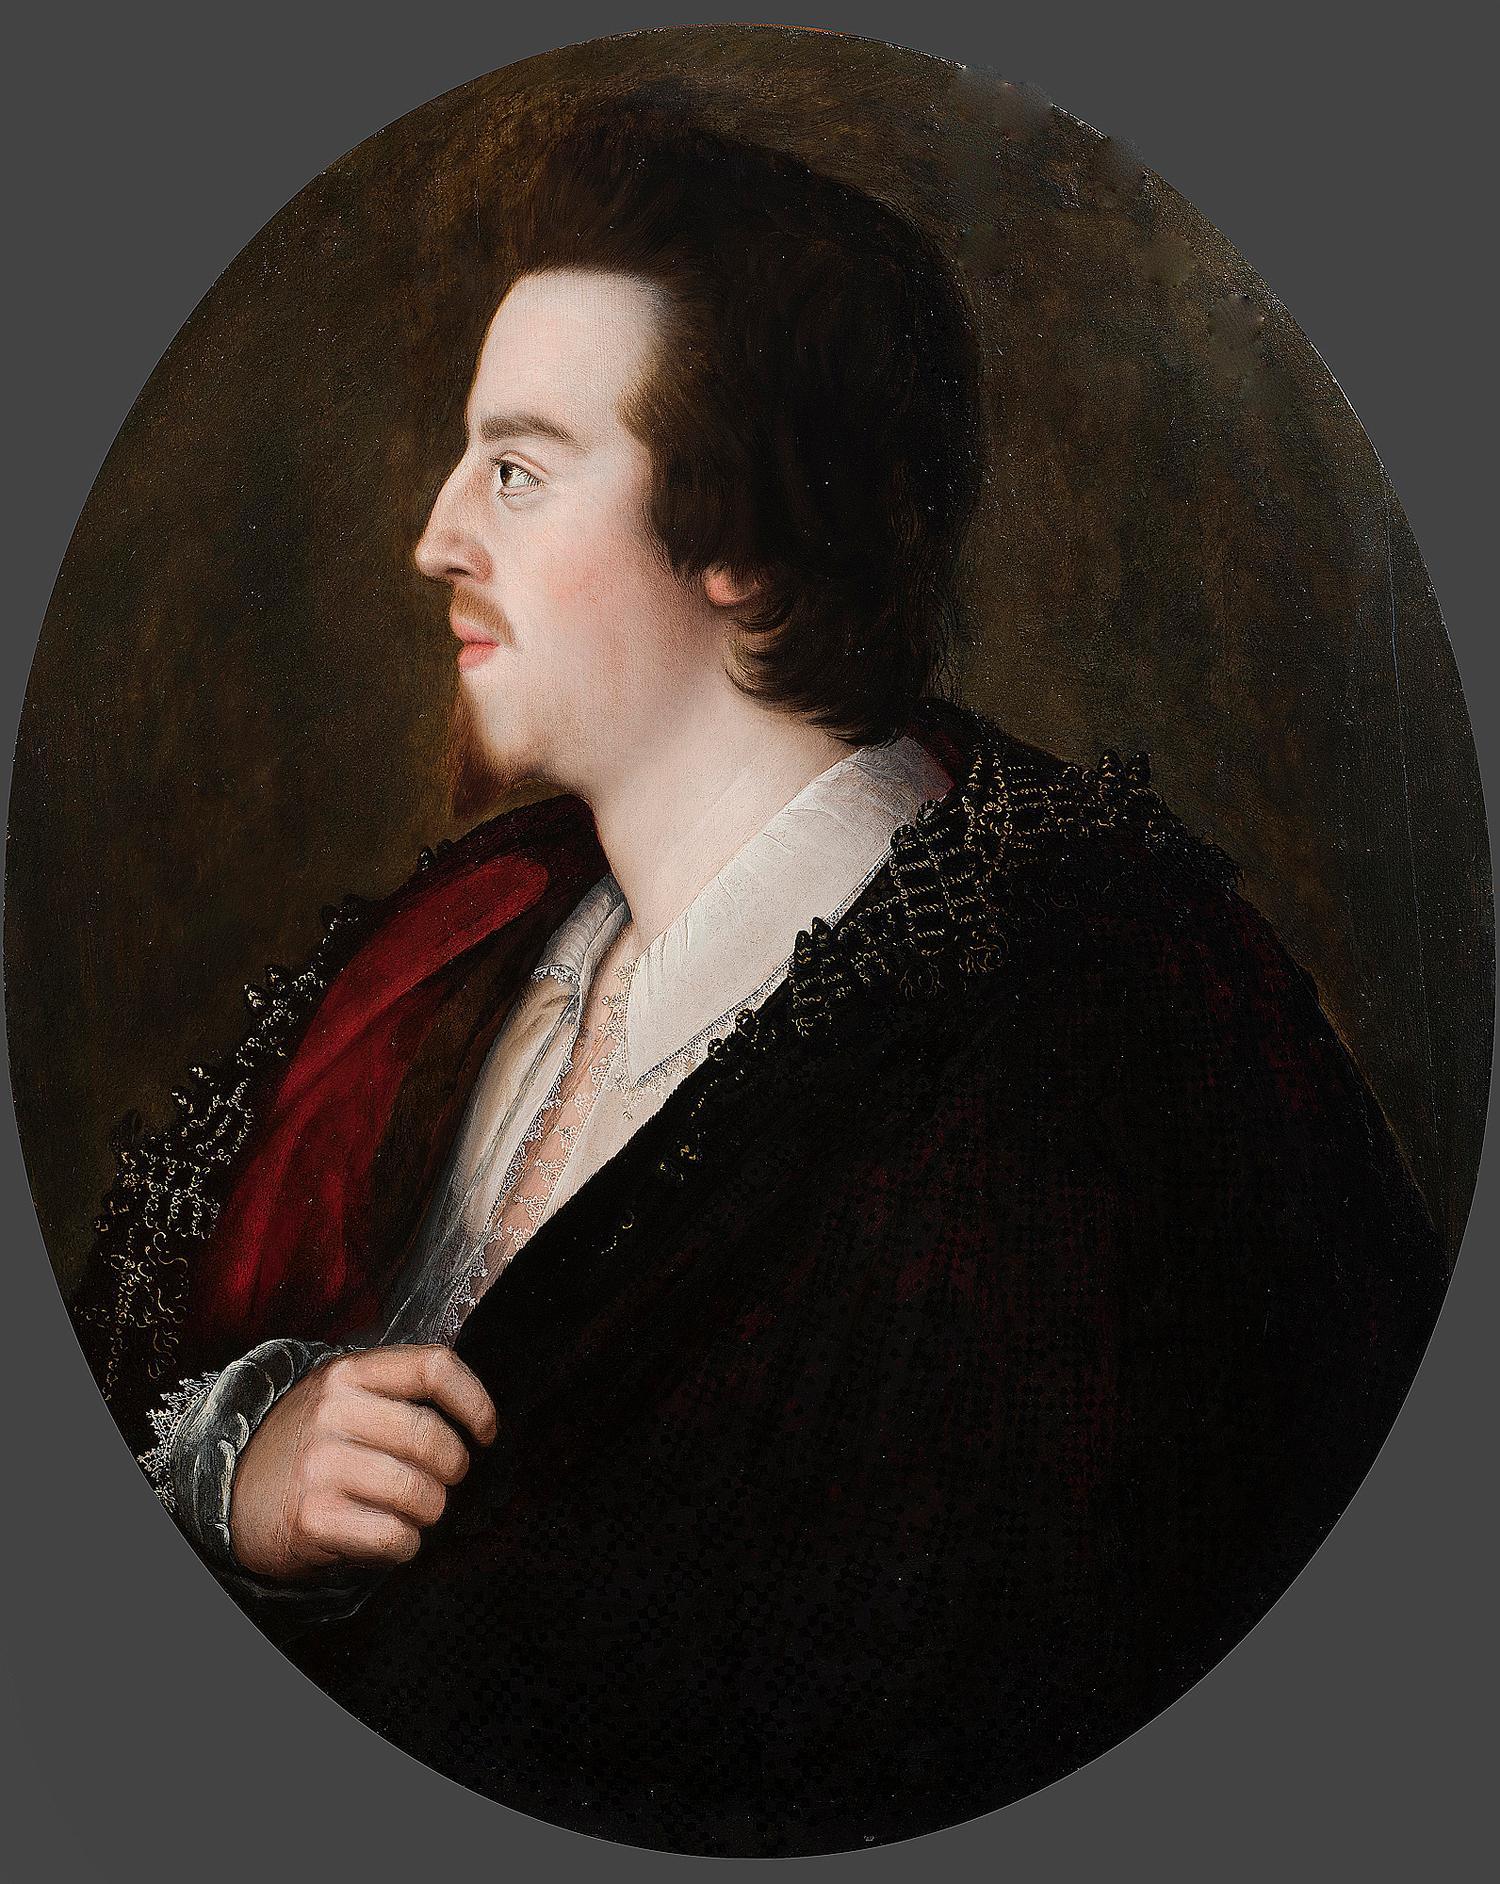 Portrait of a Melancholic Gentleman - Early 17th Century Portrait